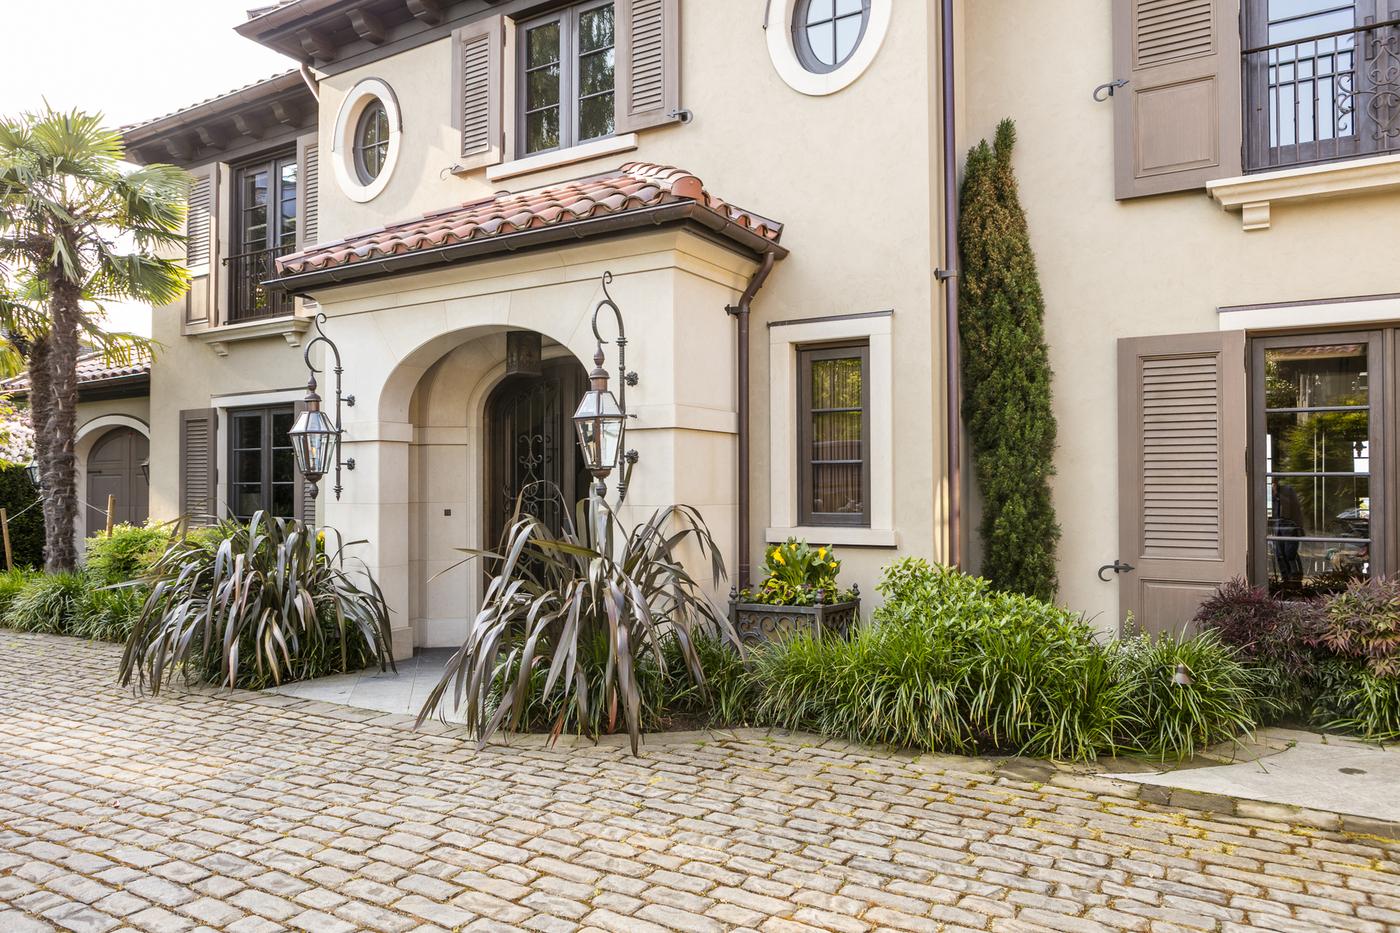 outdoor patios seattle patio driveway paving stonework